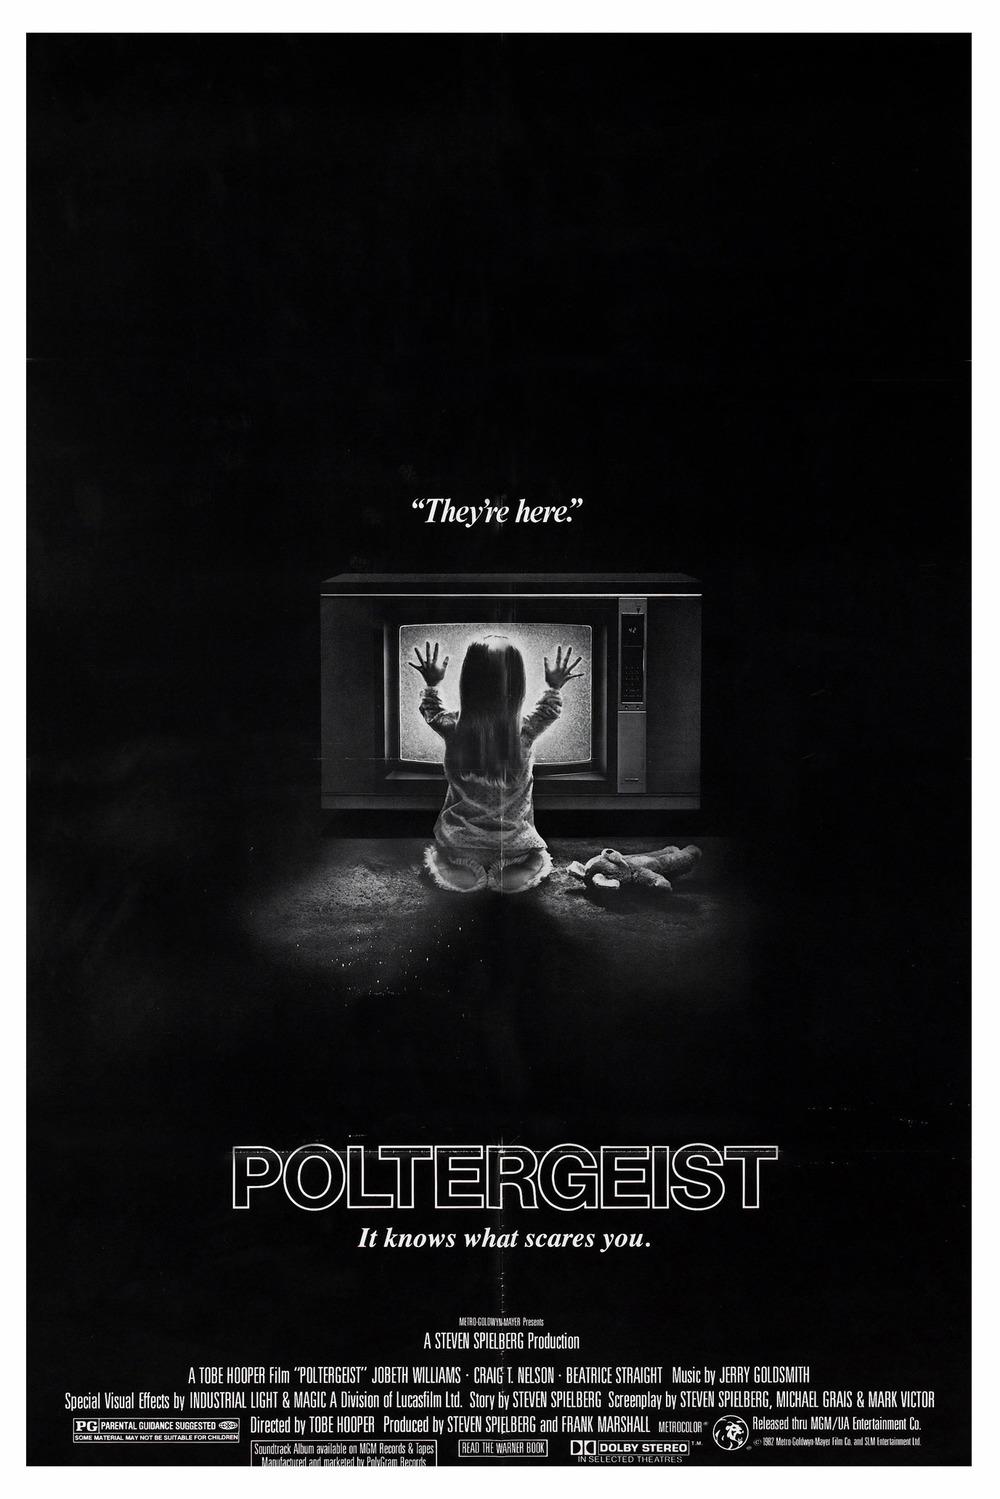 poltergeist-1982-tobe-hooper.jpg